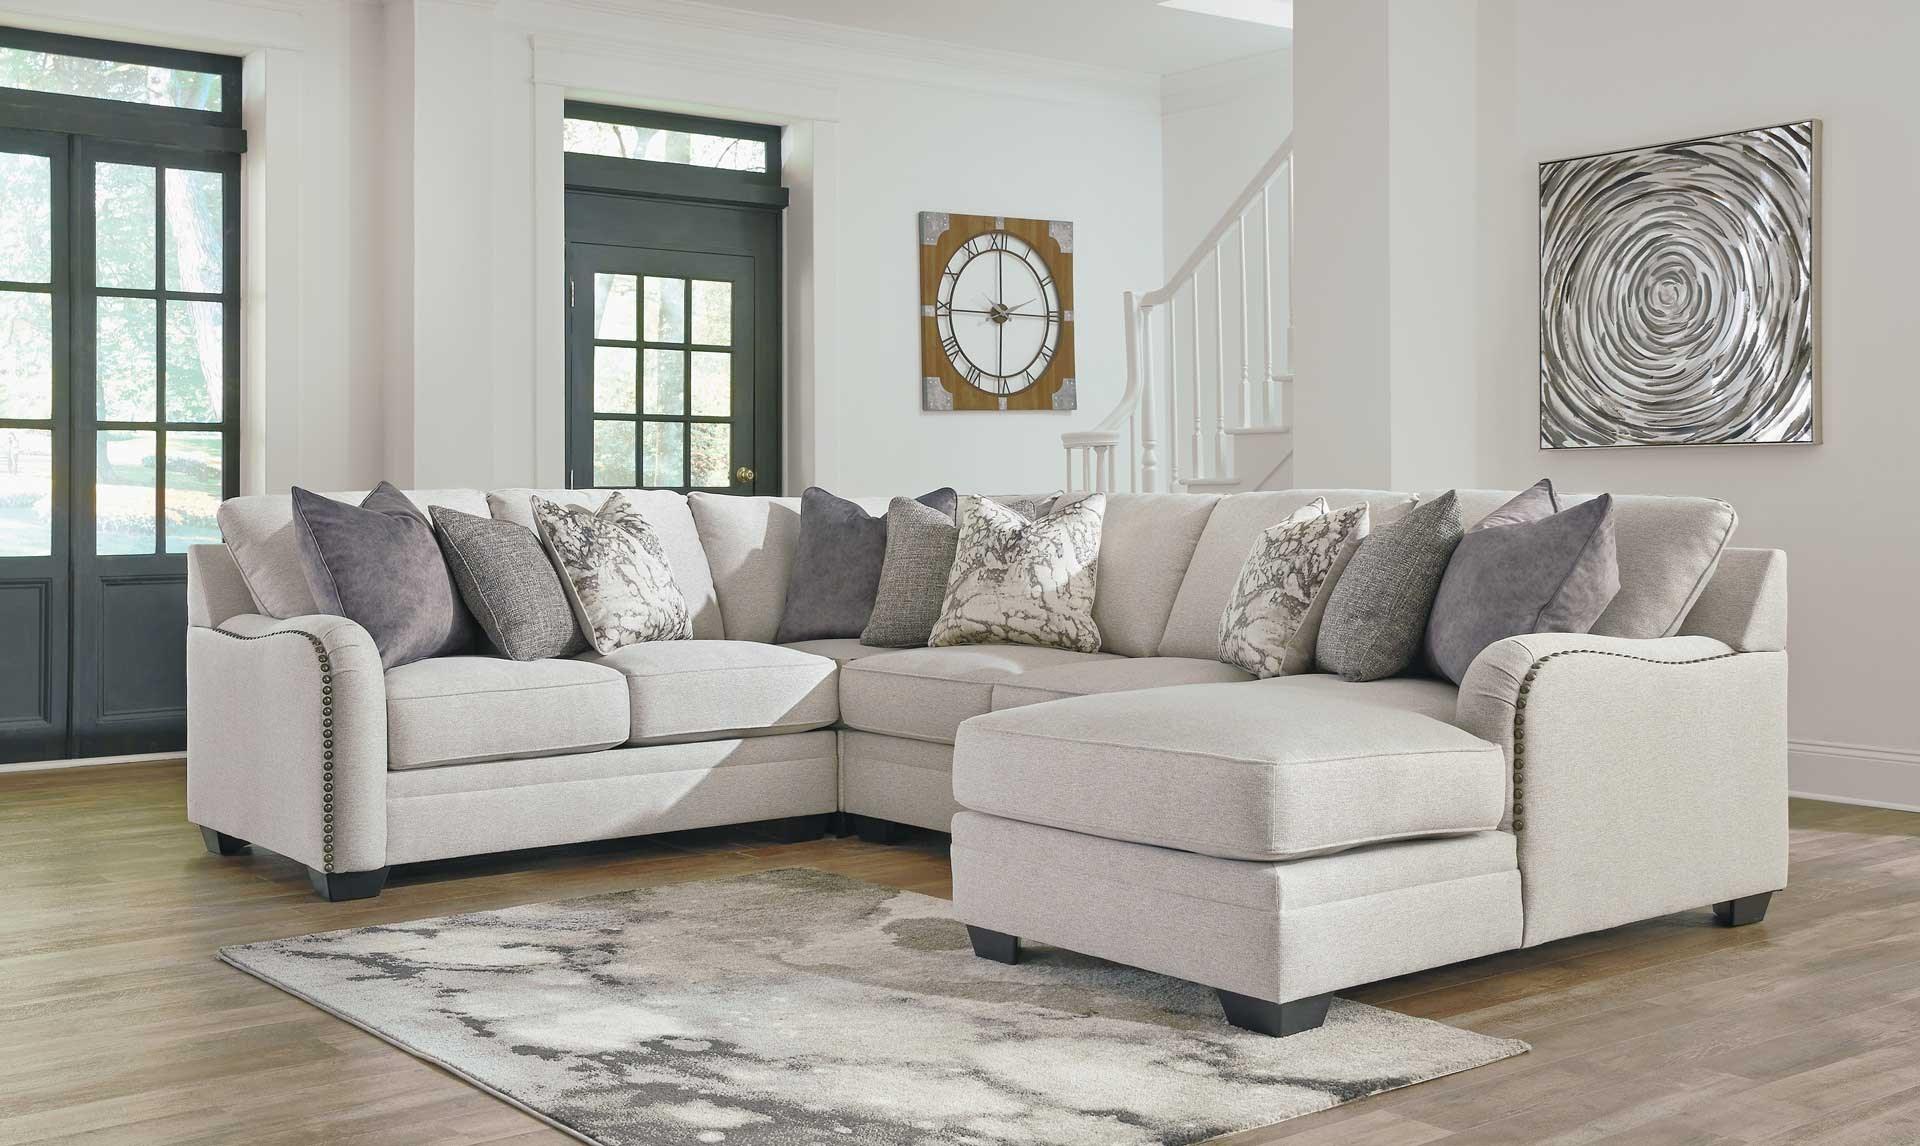 Moores home furnishings kerrville fredericksburg boerne and san antonio texas furniture mattress store